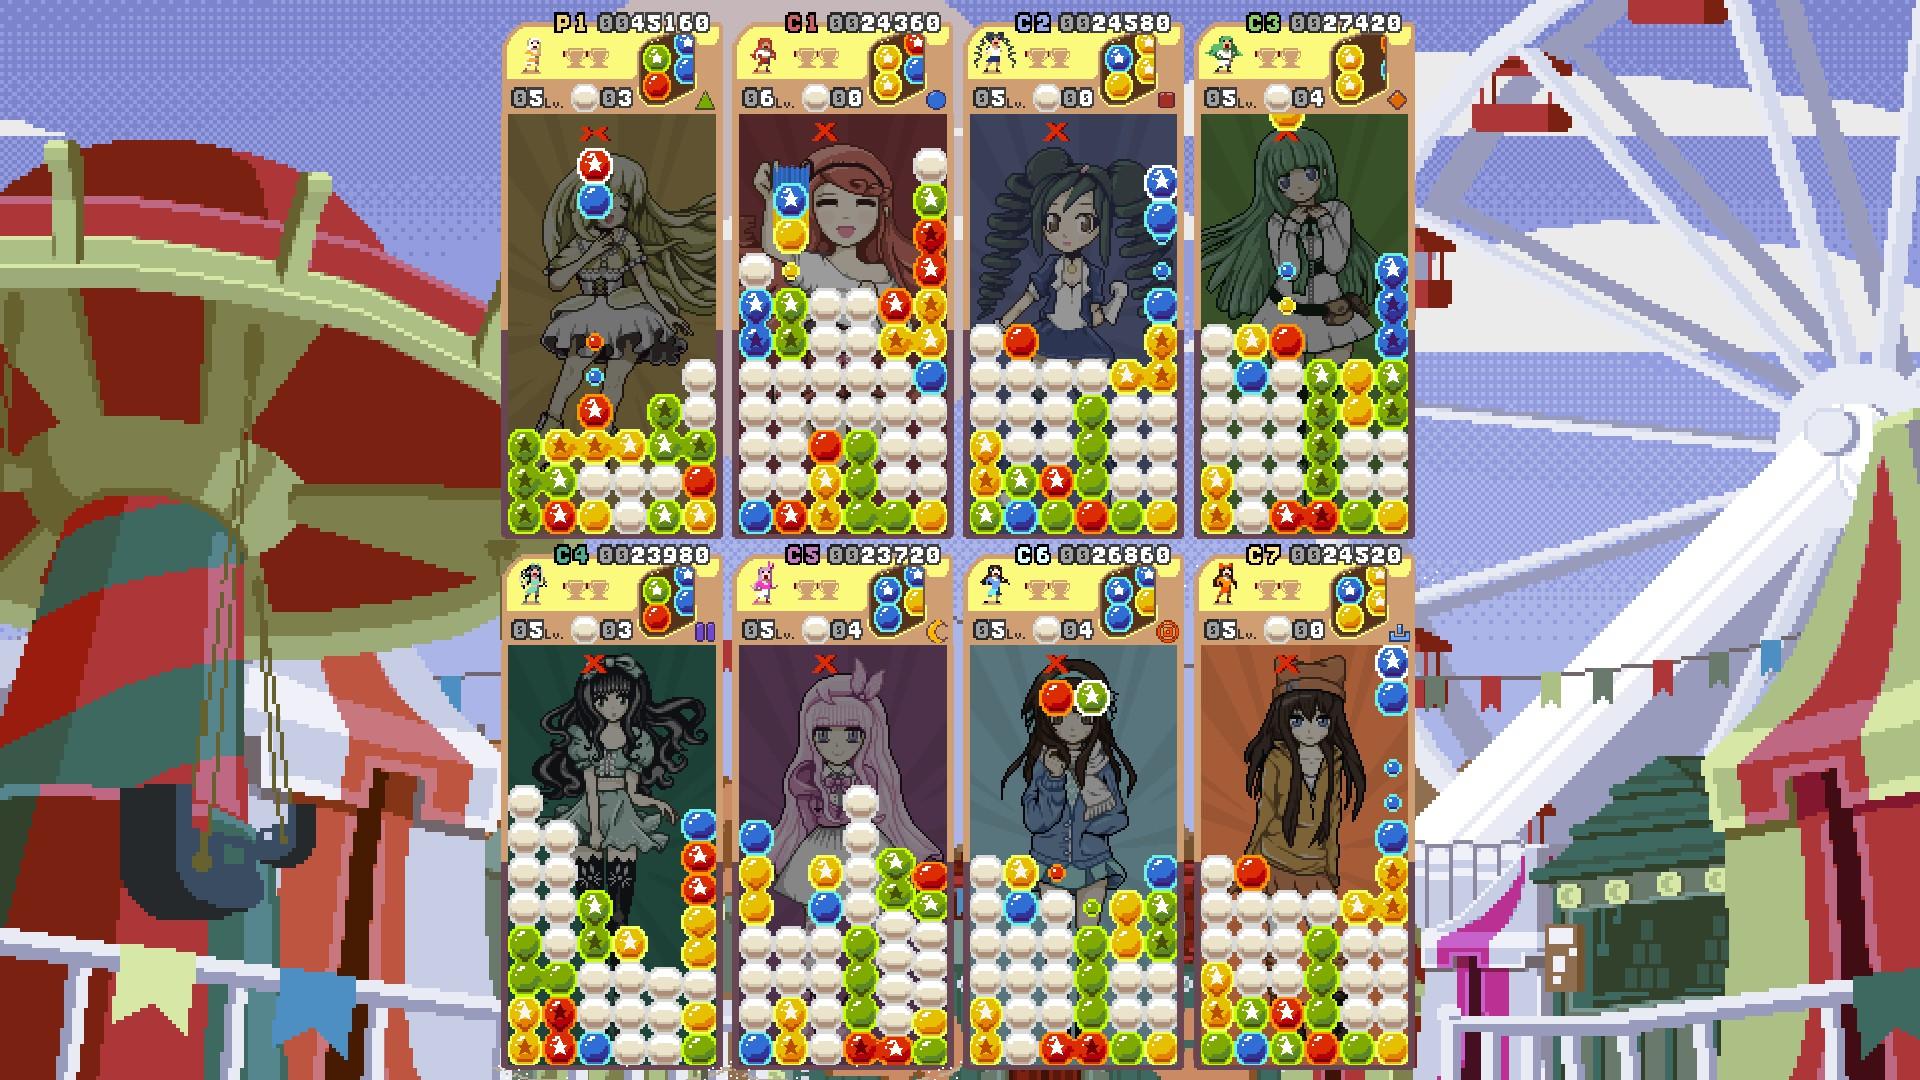 8 Player Arcade mode